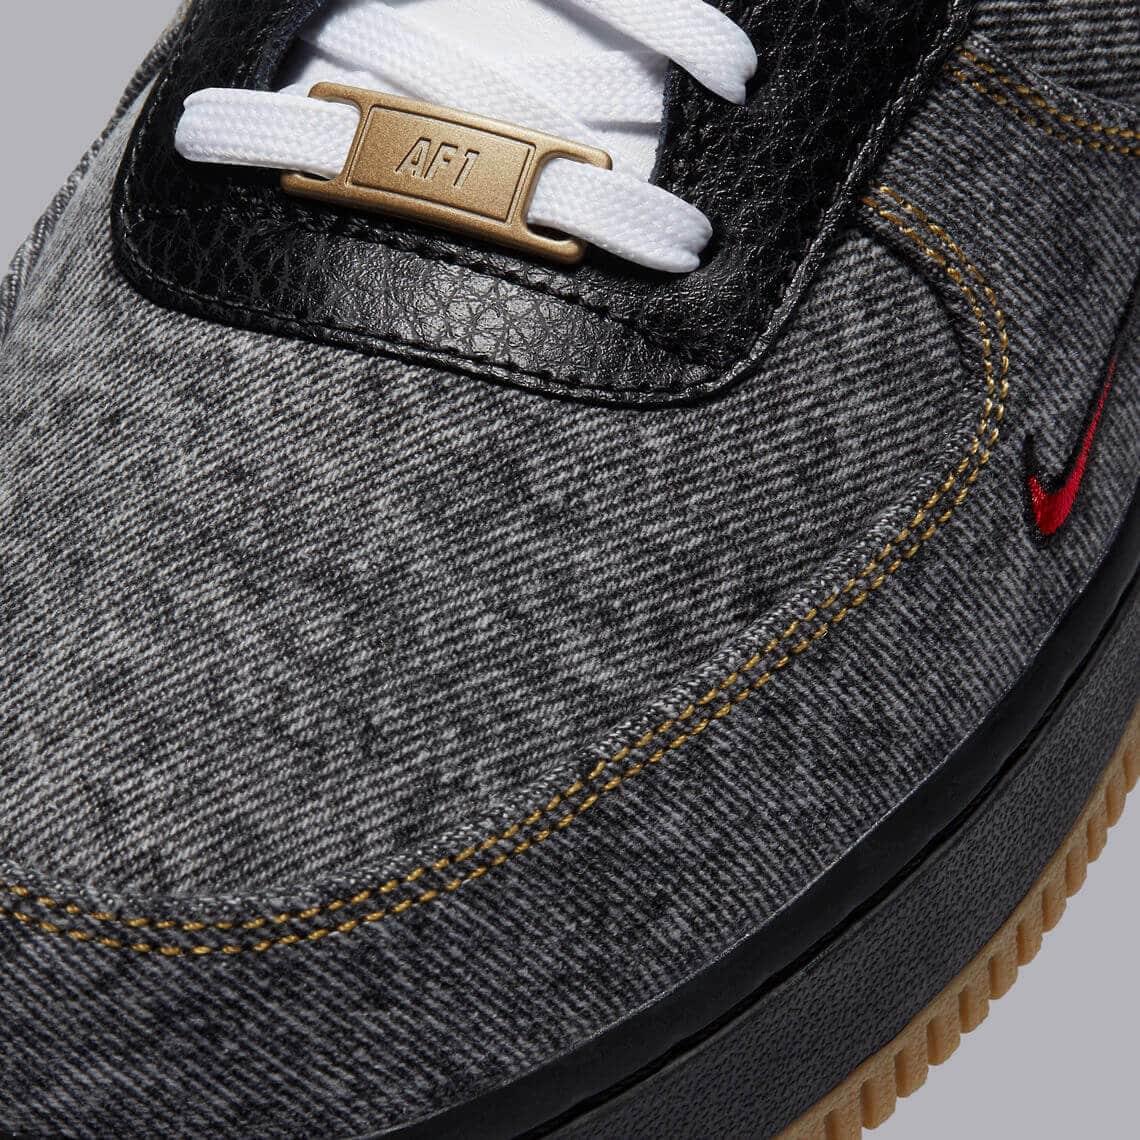 Nike Air Force 1 Remix Pack Denim DB1964 001 3